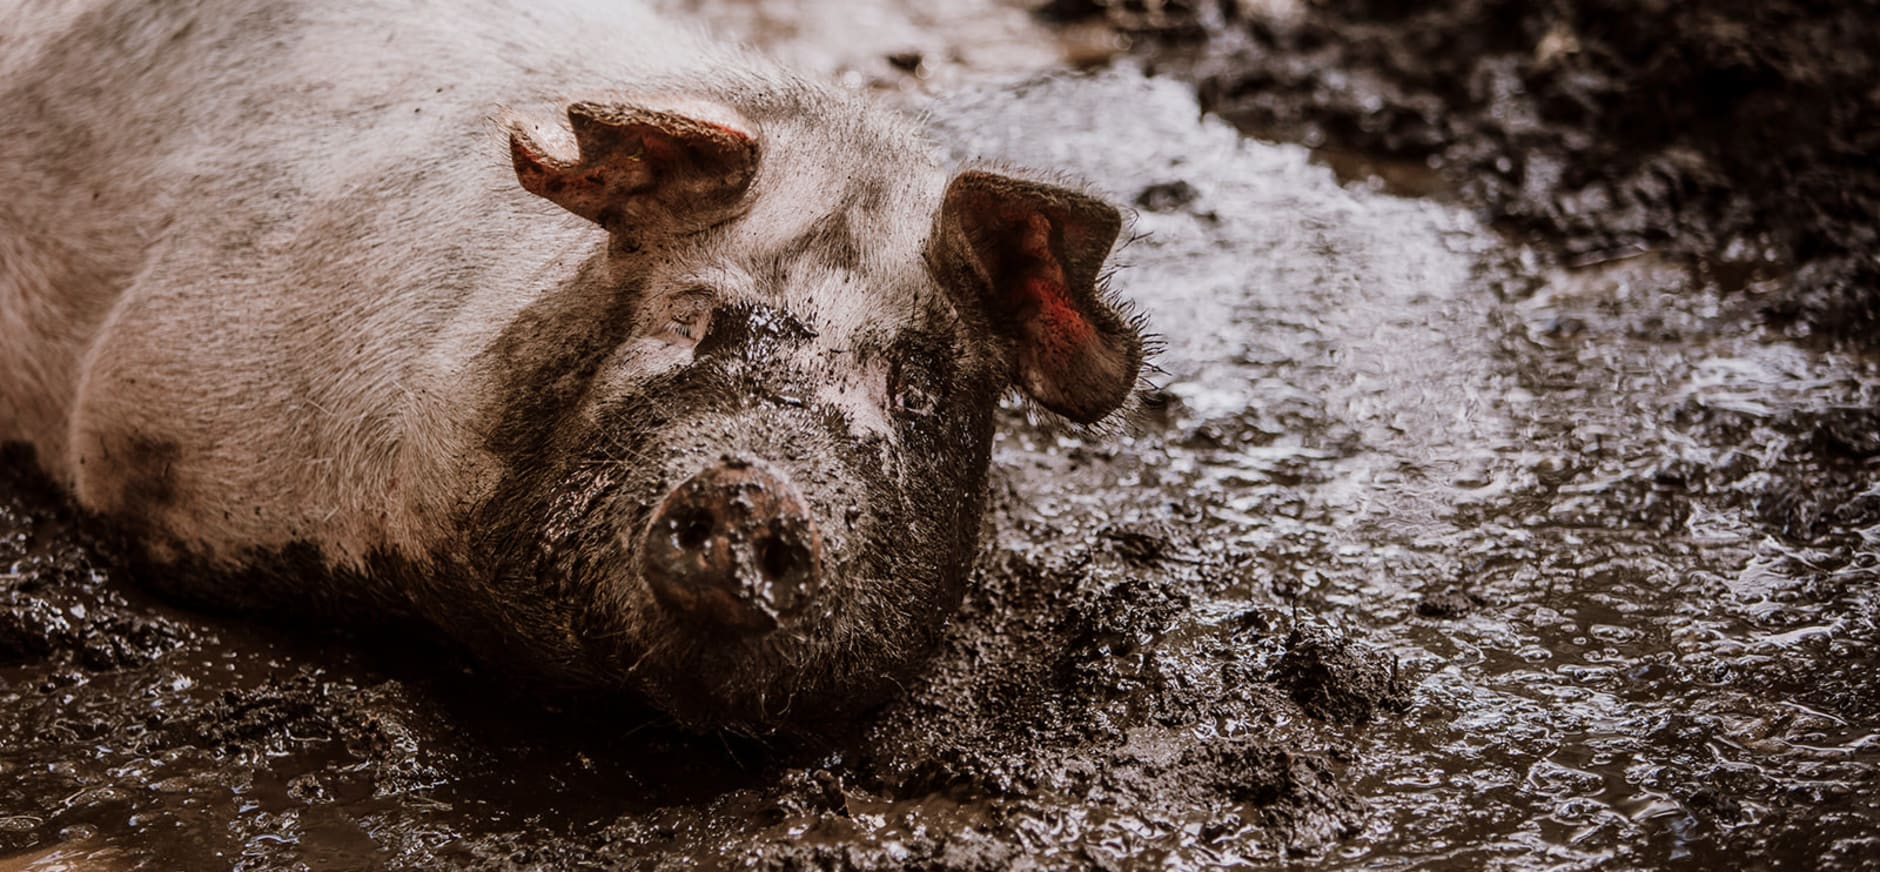 Herenboeren Groote Modderkolk varken neemt modderbad